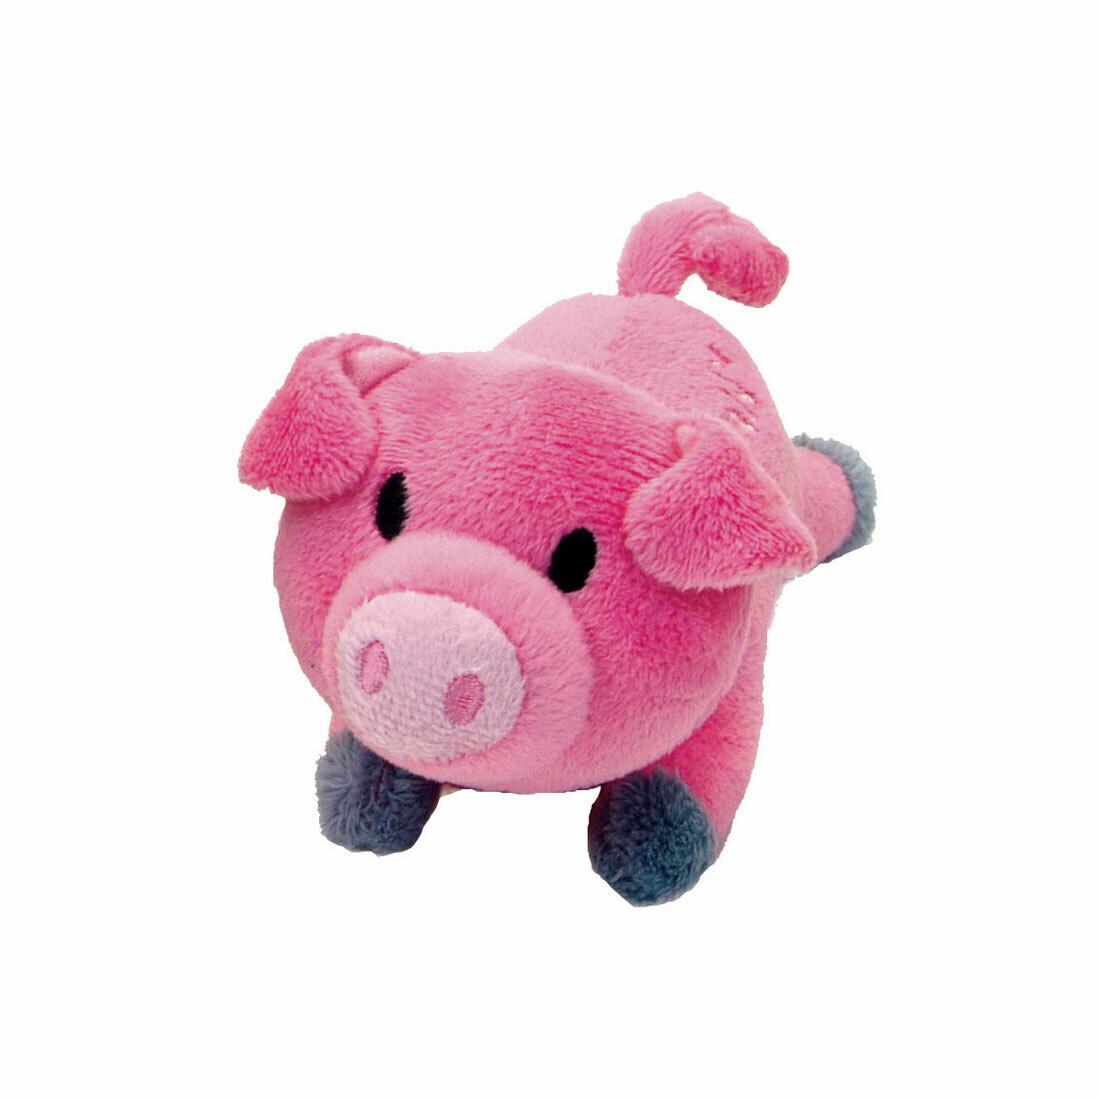 "LIL PALS PLUSH PIG 4.5""."